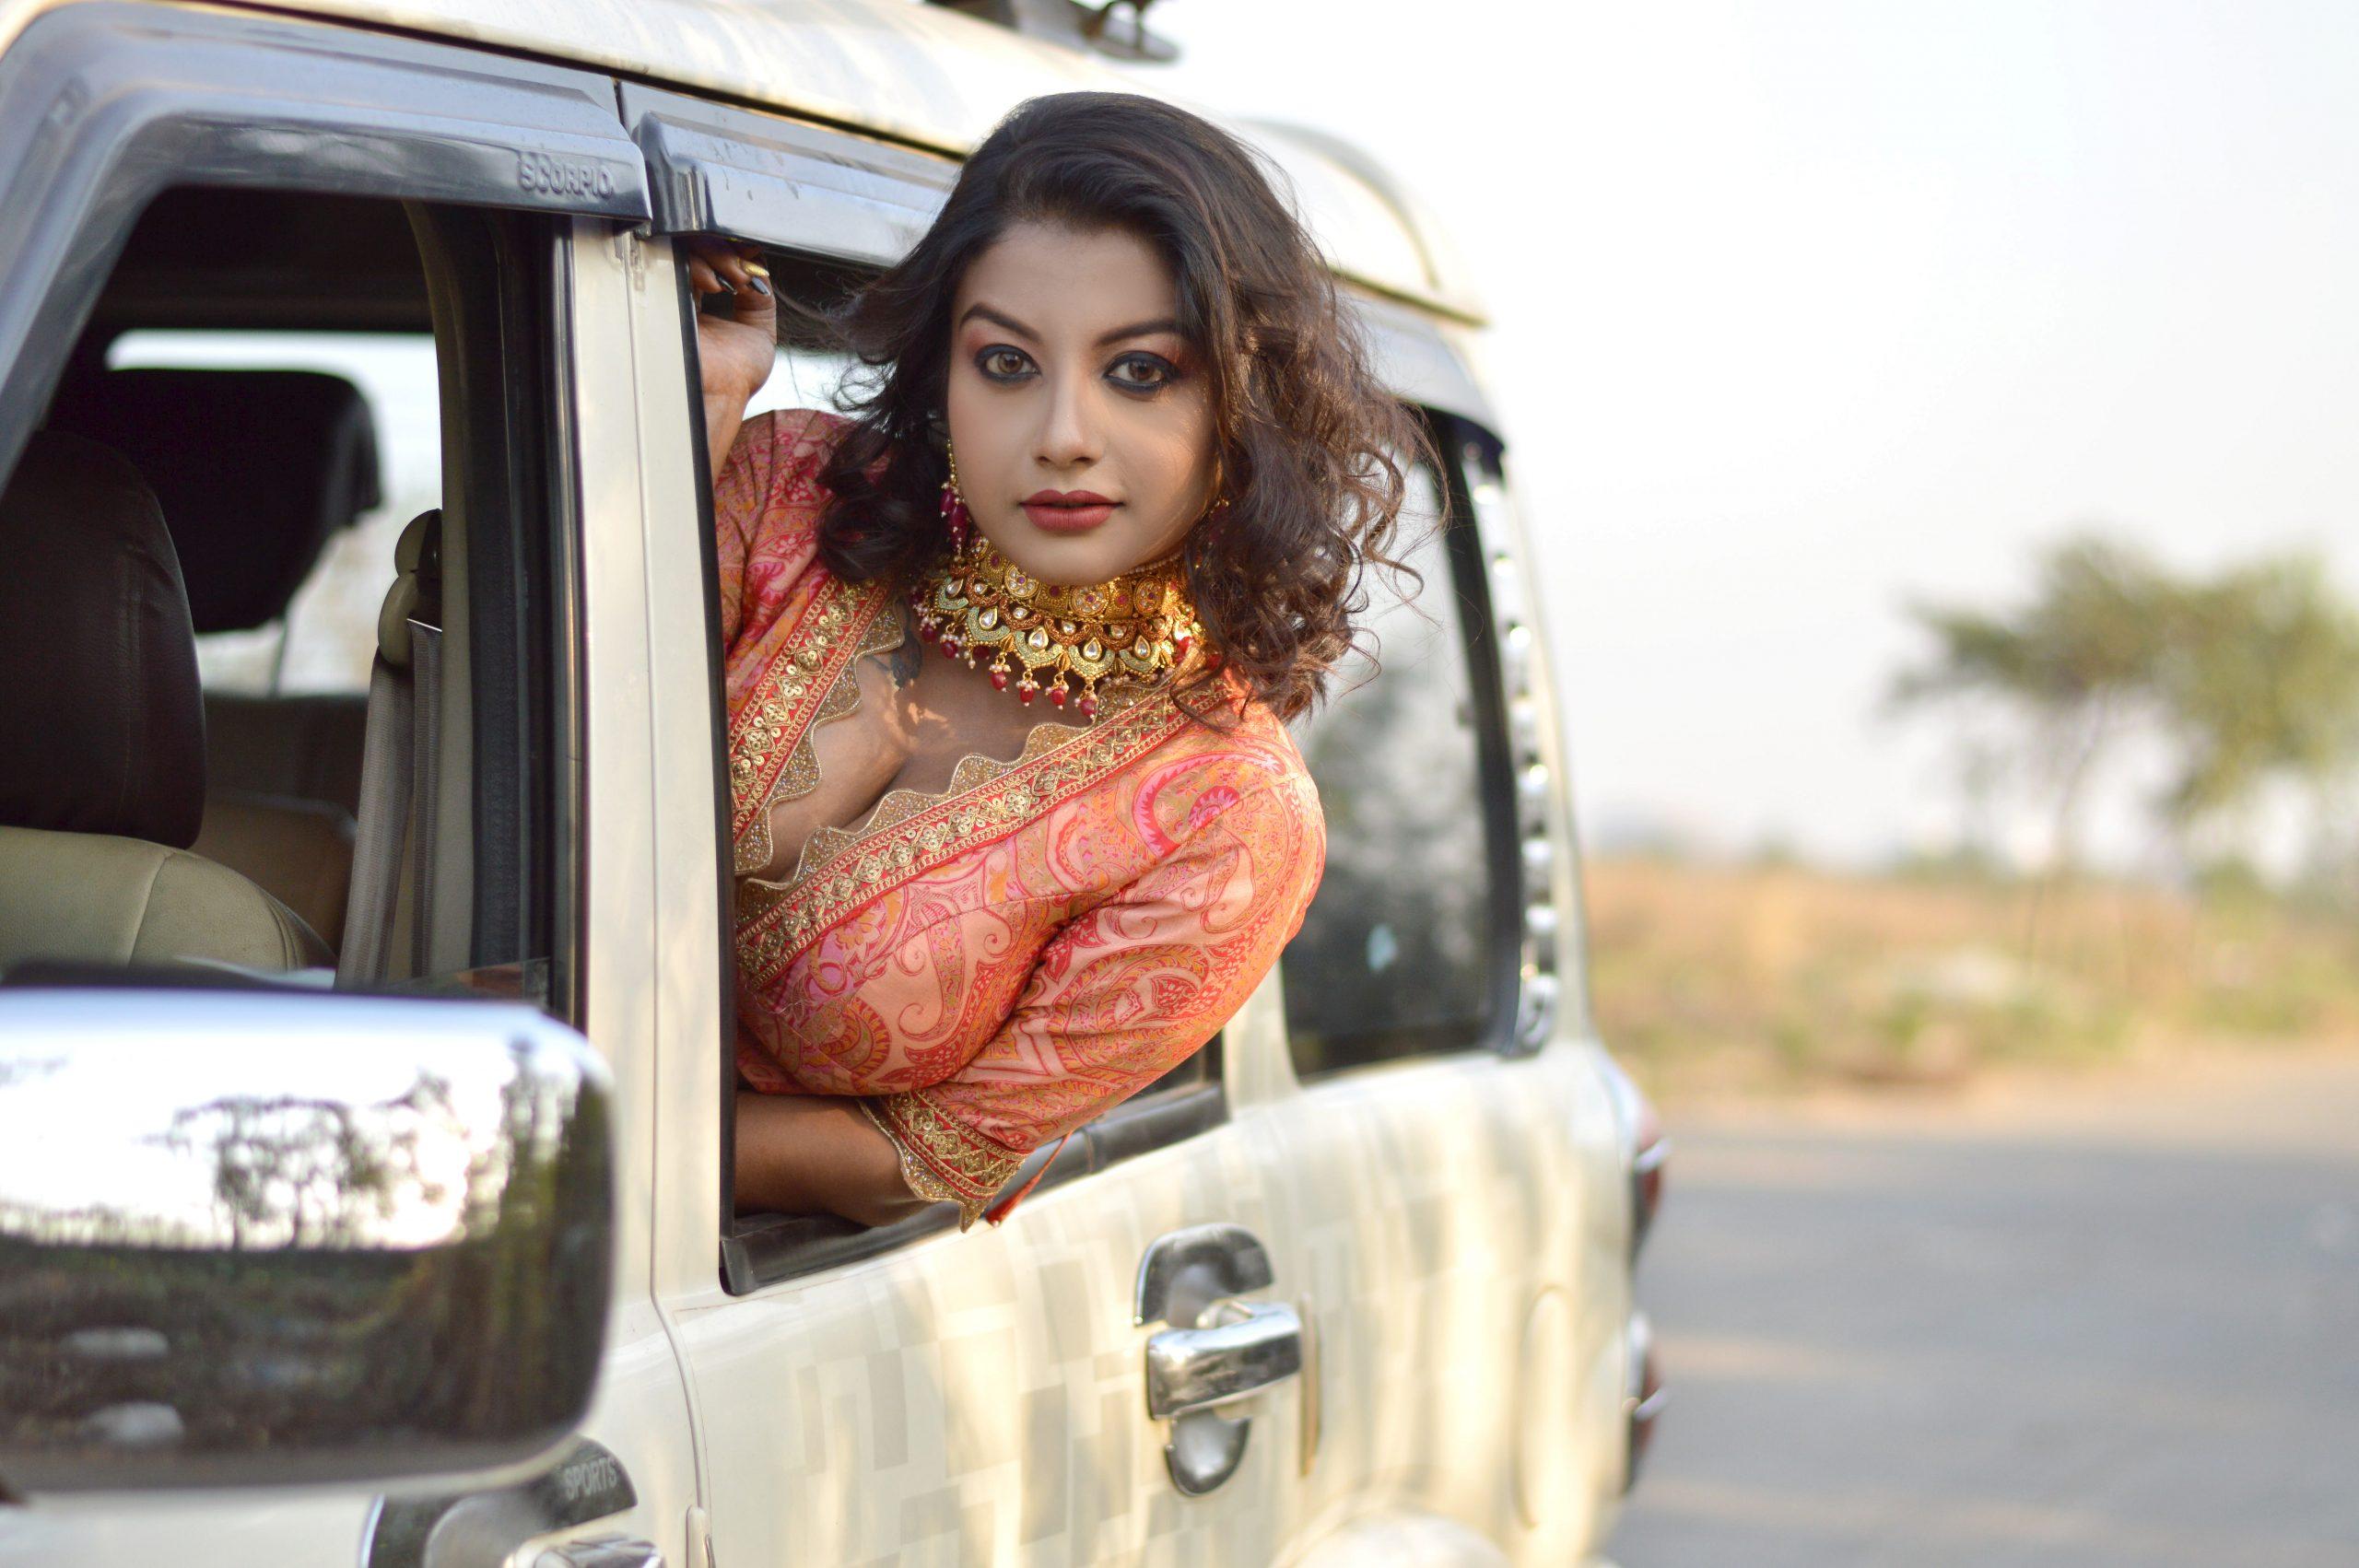 A girl peeking from a car window